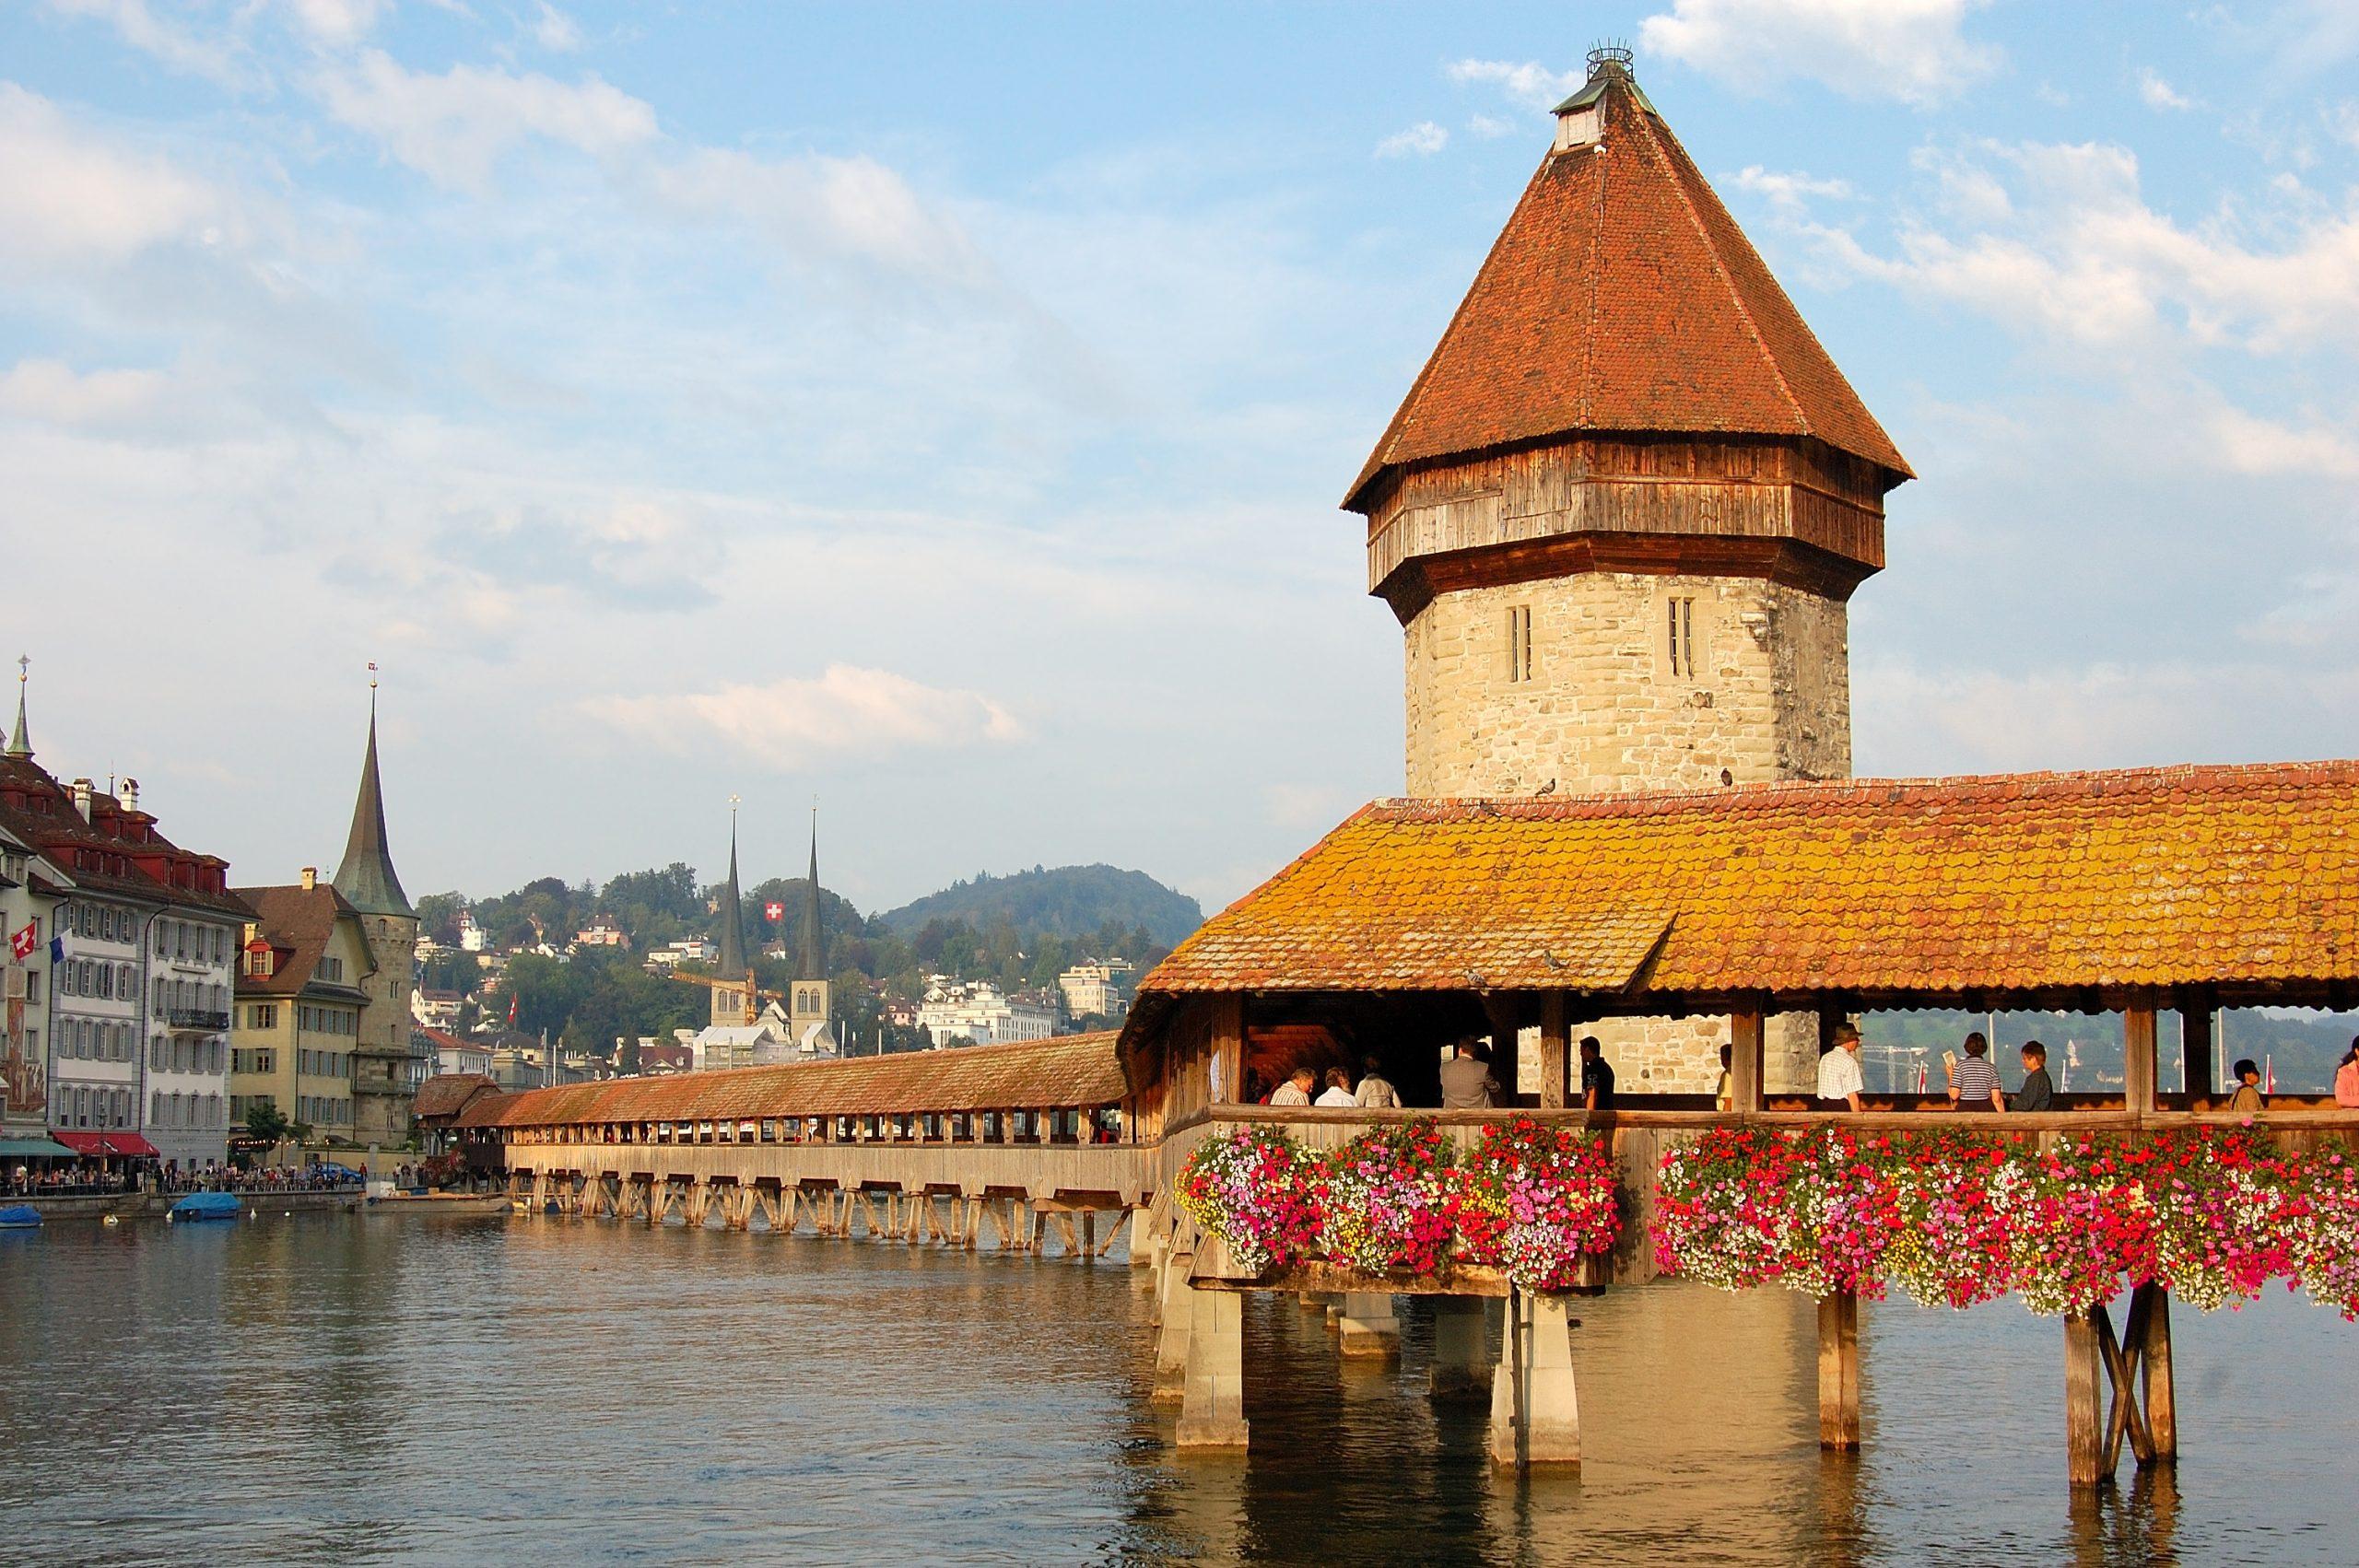 Kapellbrucke Luzern